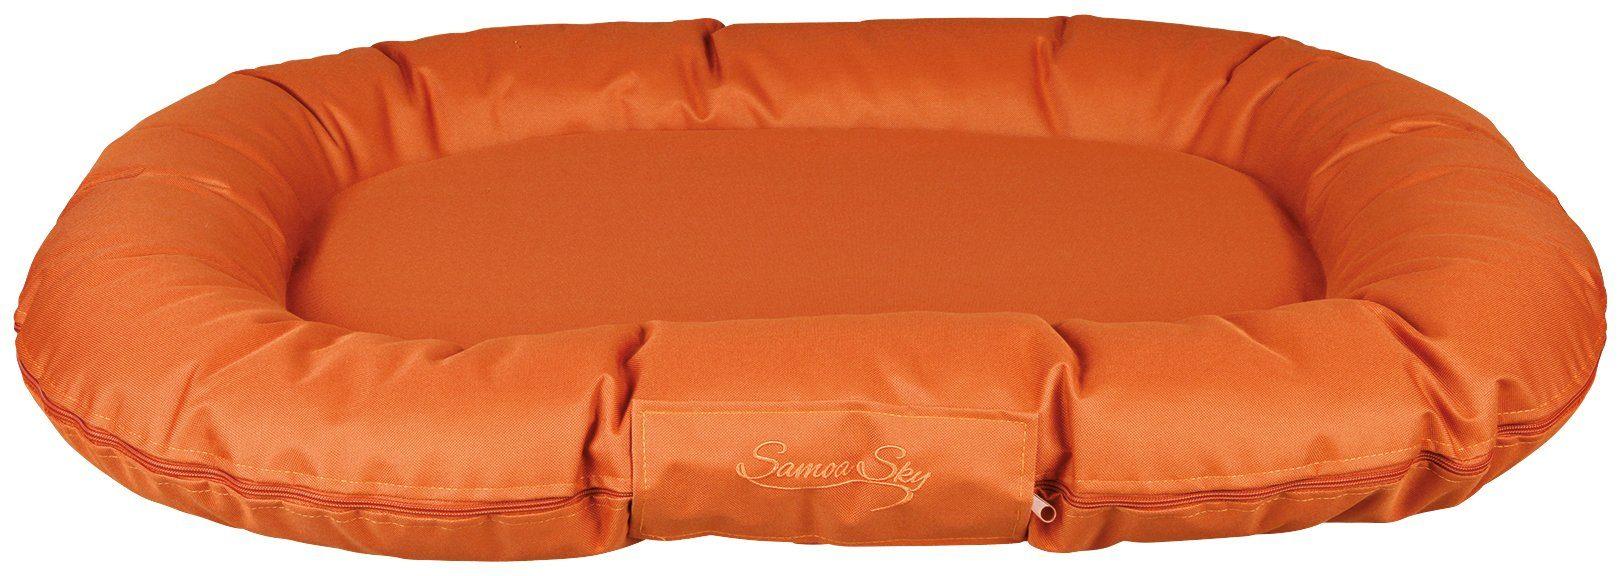 Hundekissen »Samoa Sky«, orange, BxL: 120x95 cm